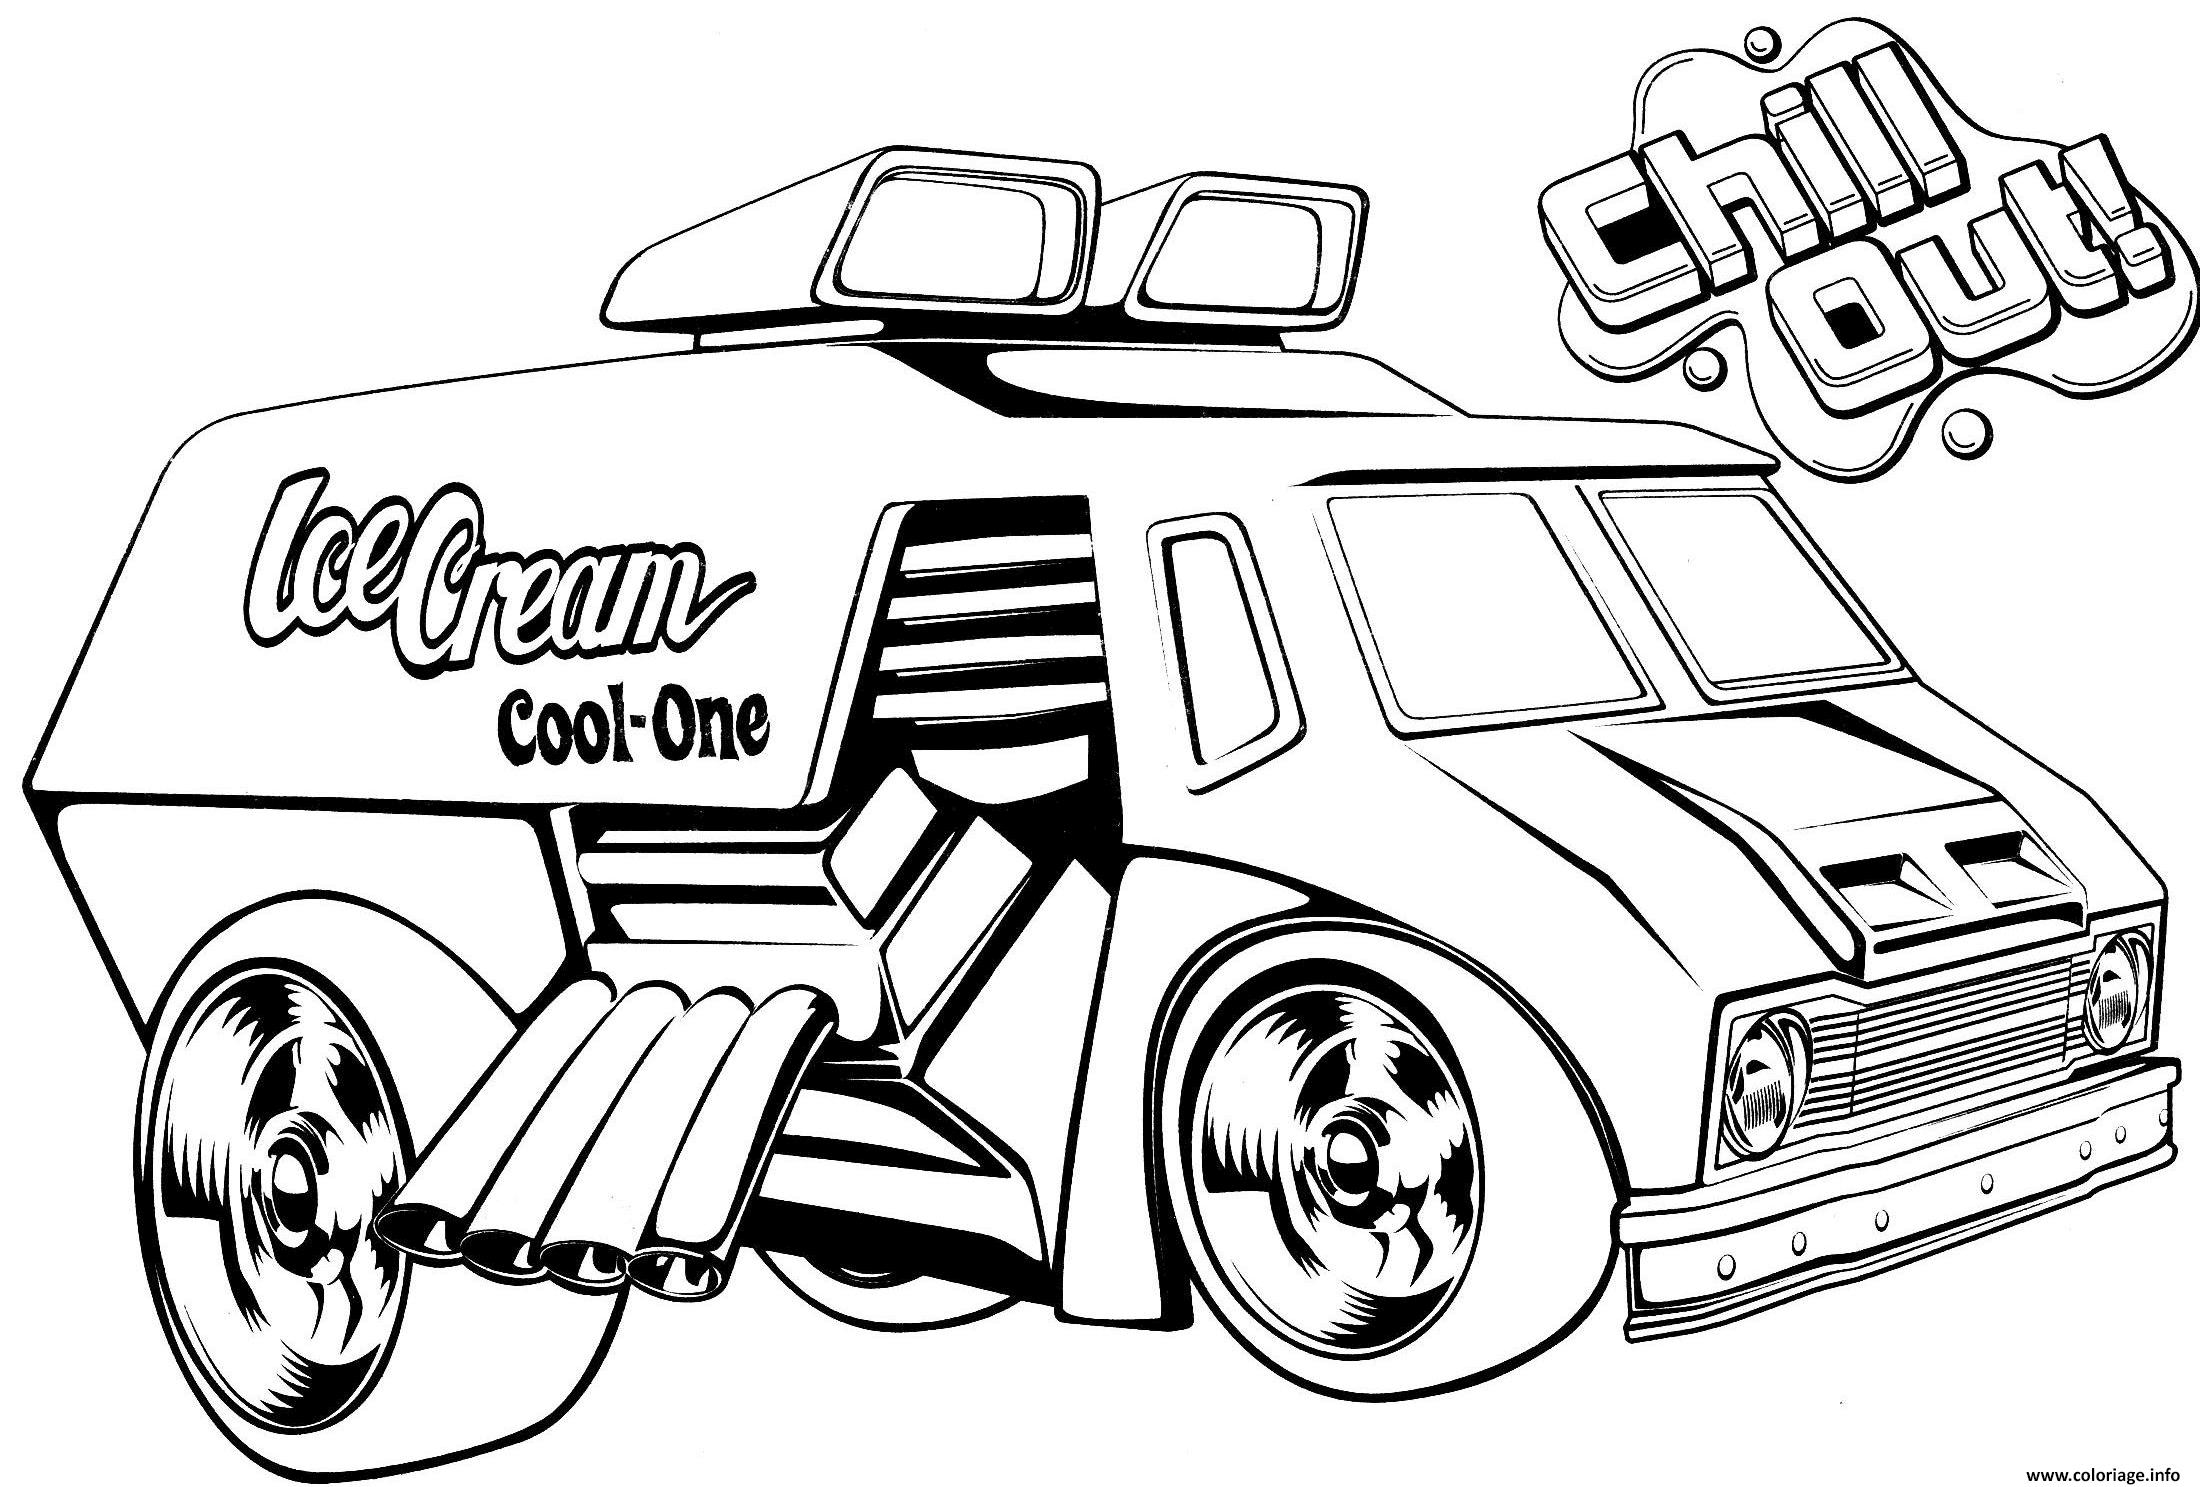 Dessin hot wheels ice cream truck Coloriage Gratuit à Imprimer